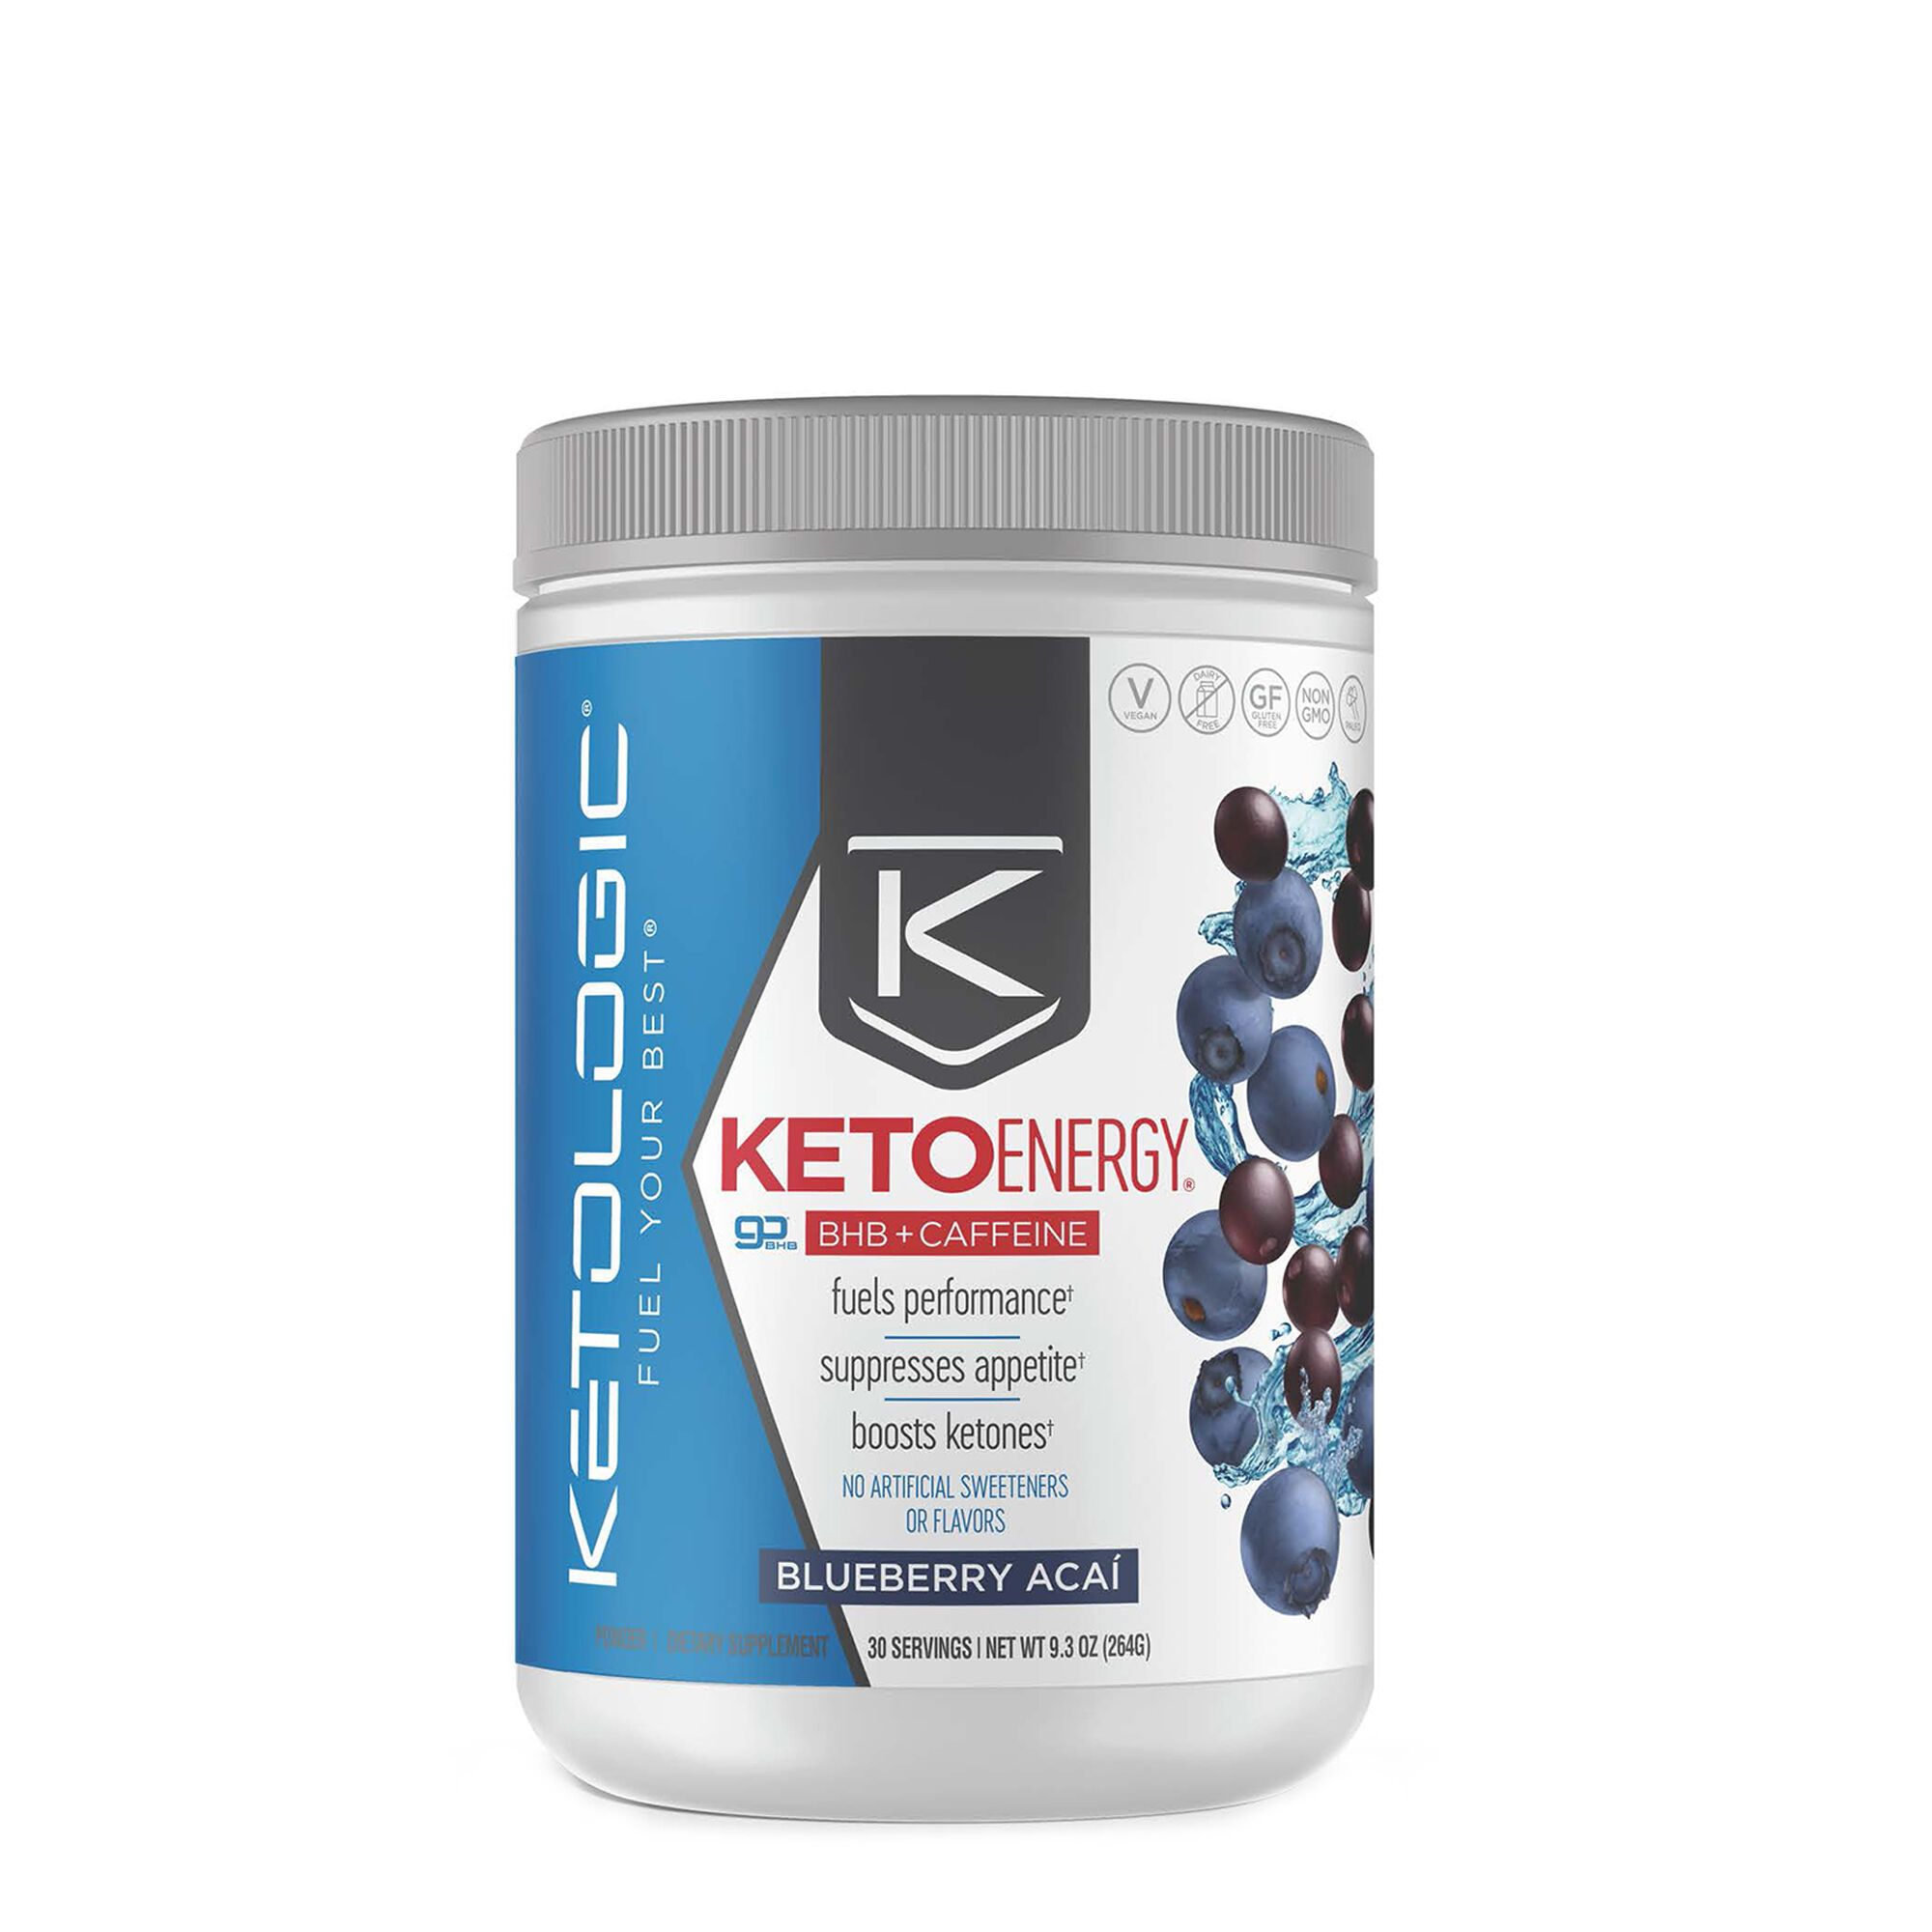 Ketoenergy Bhb + Caffeine - Blueberry Acai | Paleo protein ...